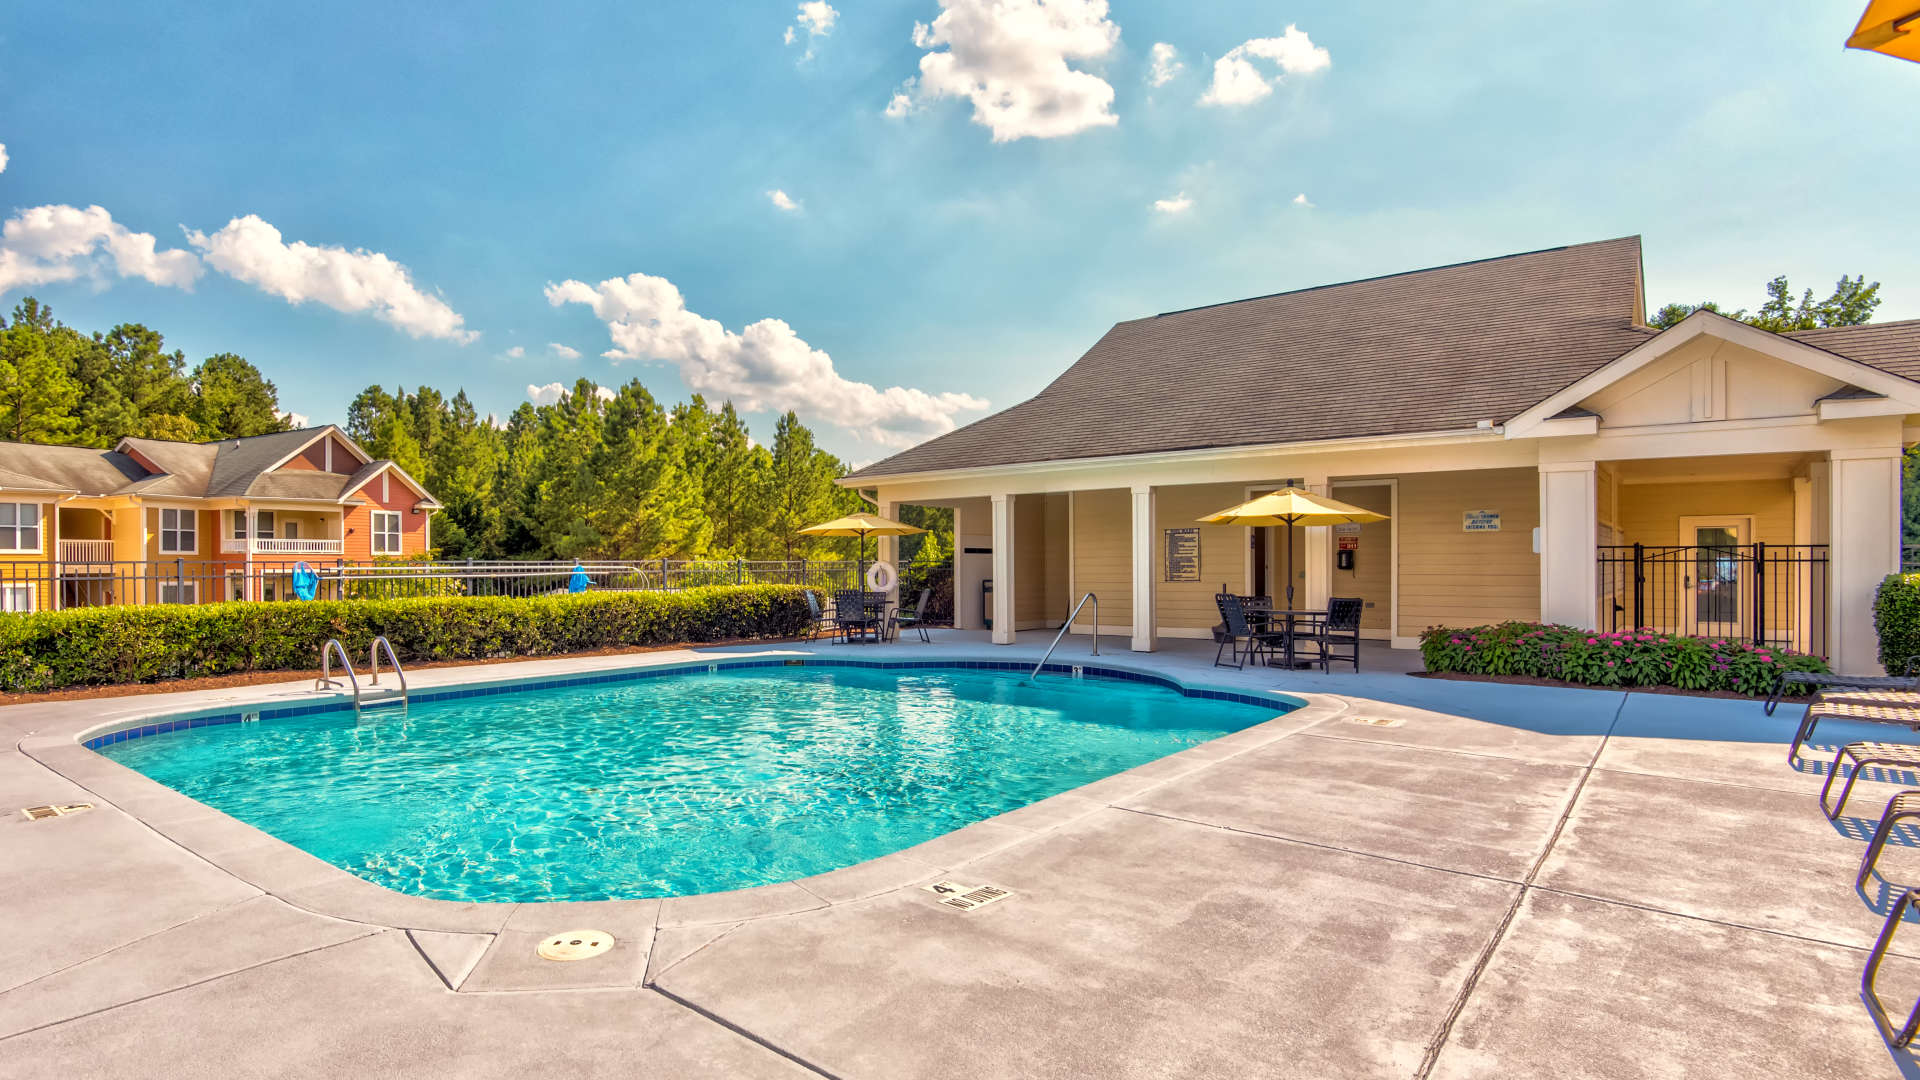 Swimming pool at 200 East in Durham, North Carolina